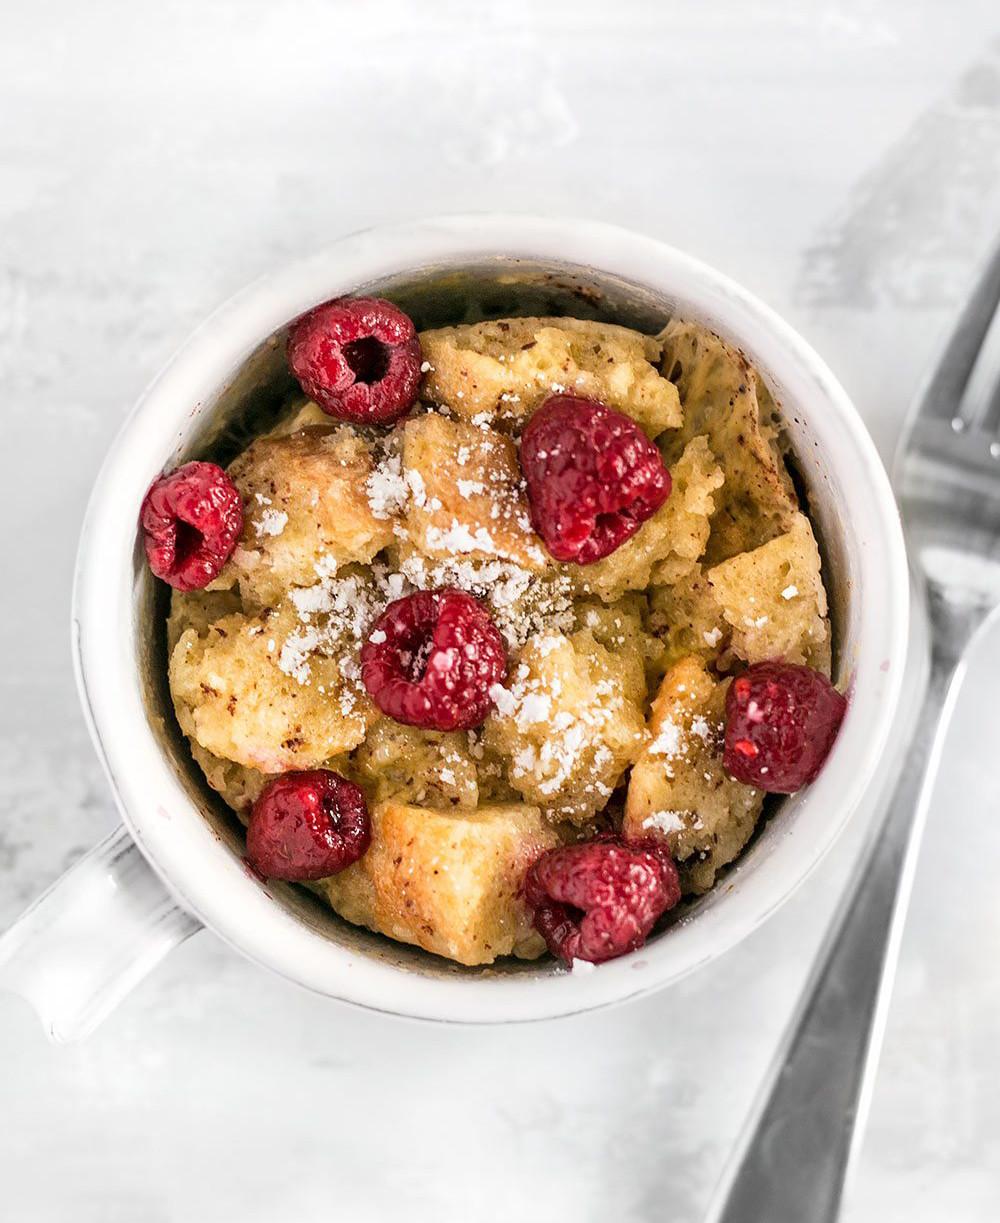 Breakfast Mug Recipes  10 Delicious and Easy Breakfast Microwave Mug Recipes